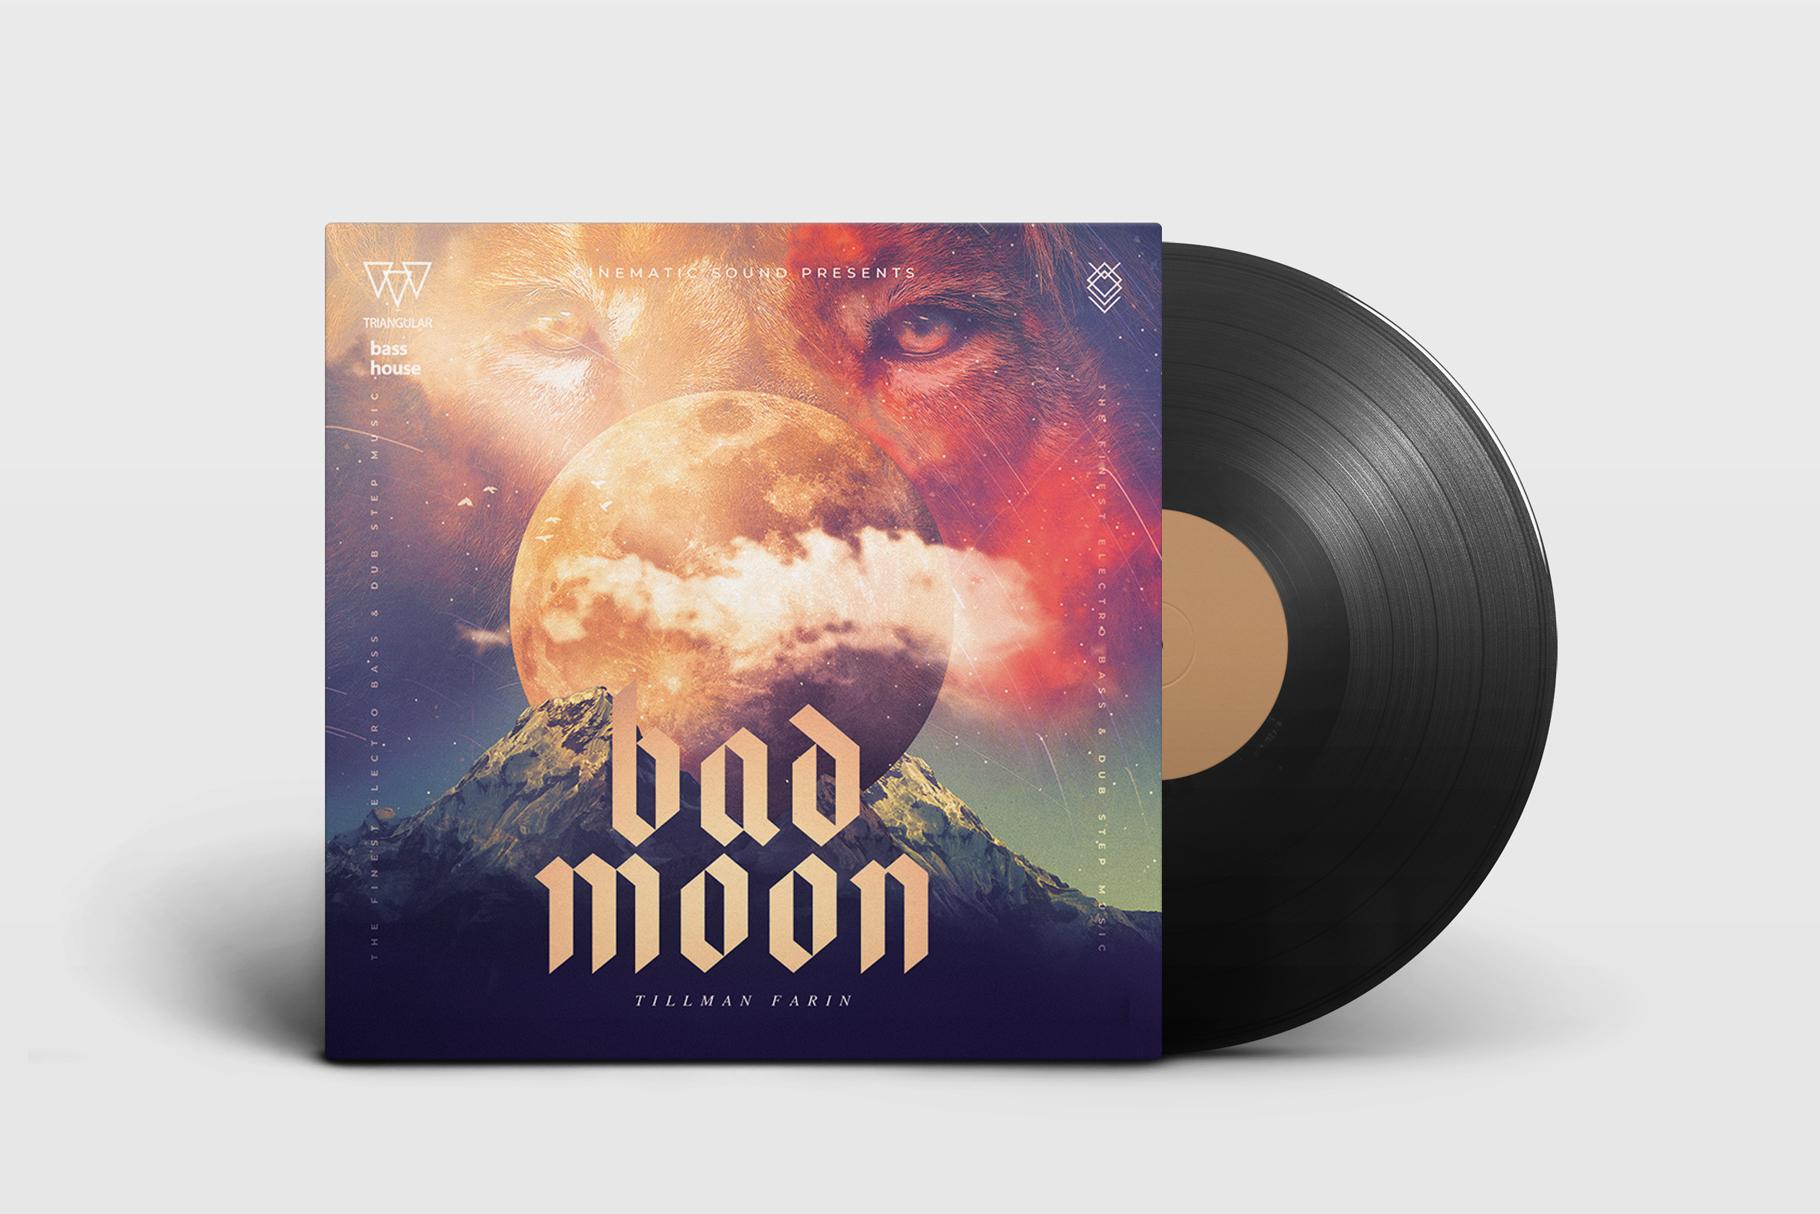 Bad Moon Album Cover Art example image 2